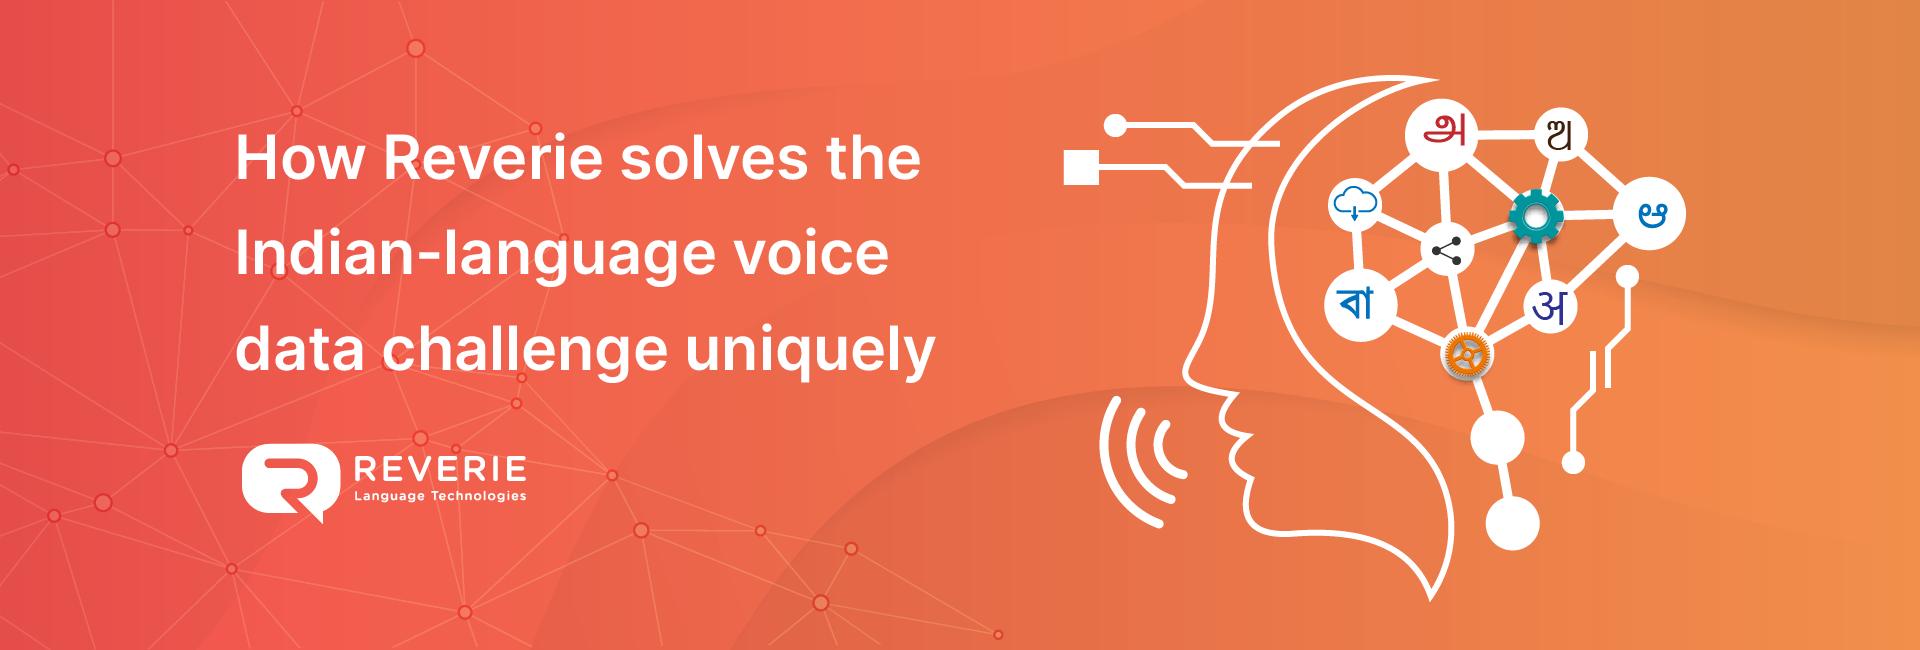 Indian language voice data challenge